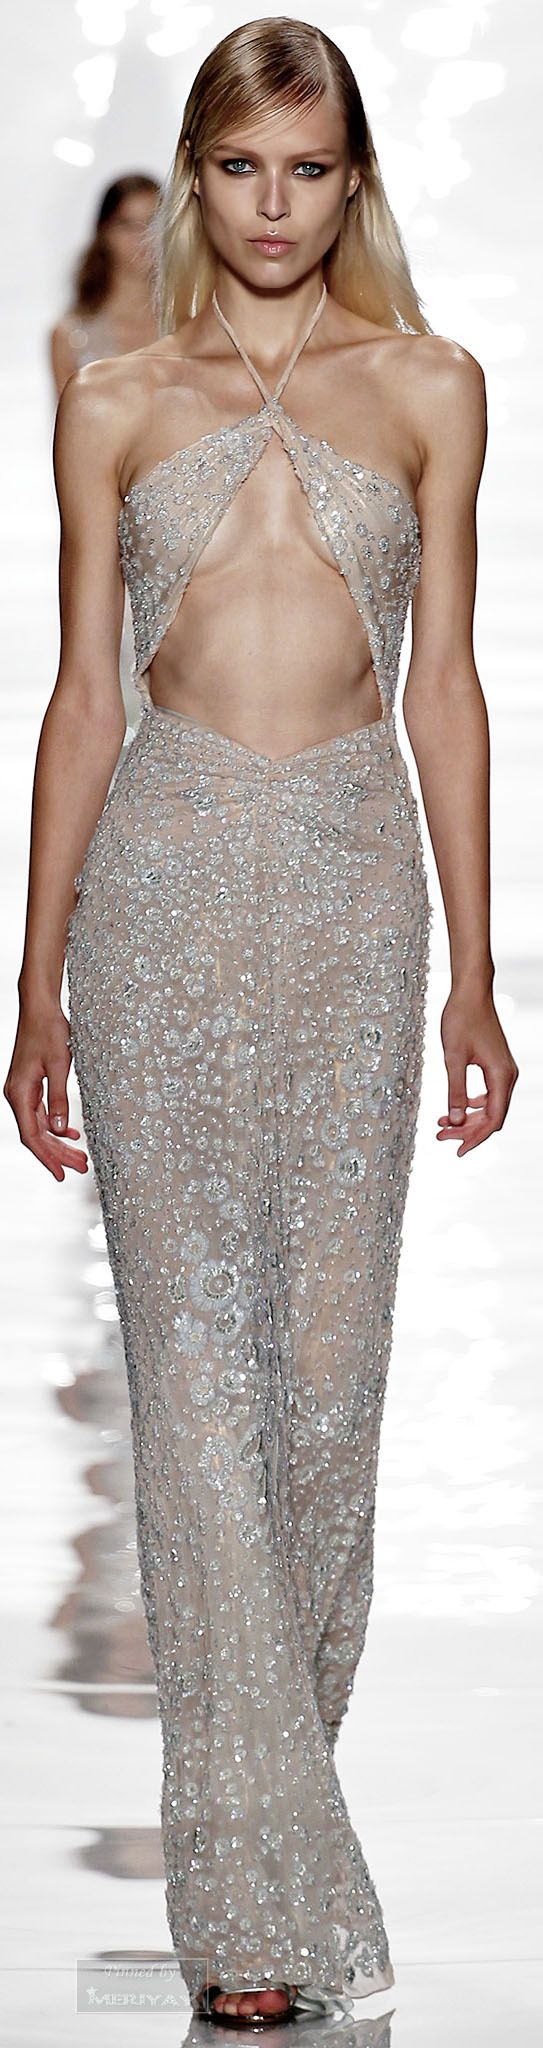 130 Best Evening Wear Silhouettes Images On Pinterest Minimal Tulle Embroidery Dress Fleur Land Putih S Reem Acraspring Summer 2015